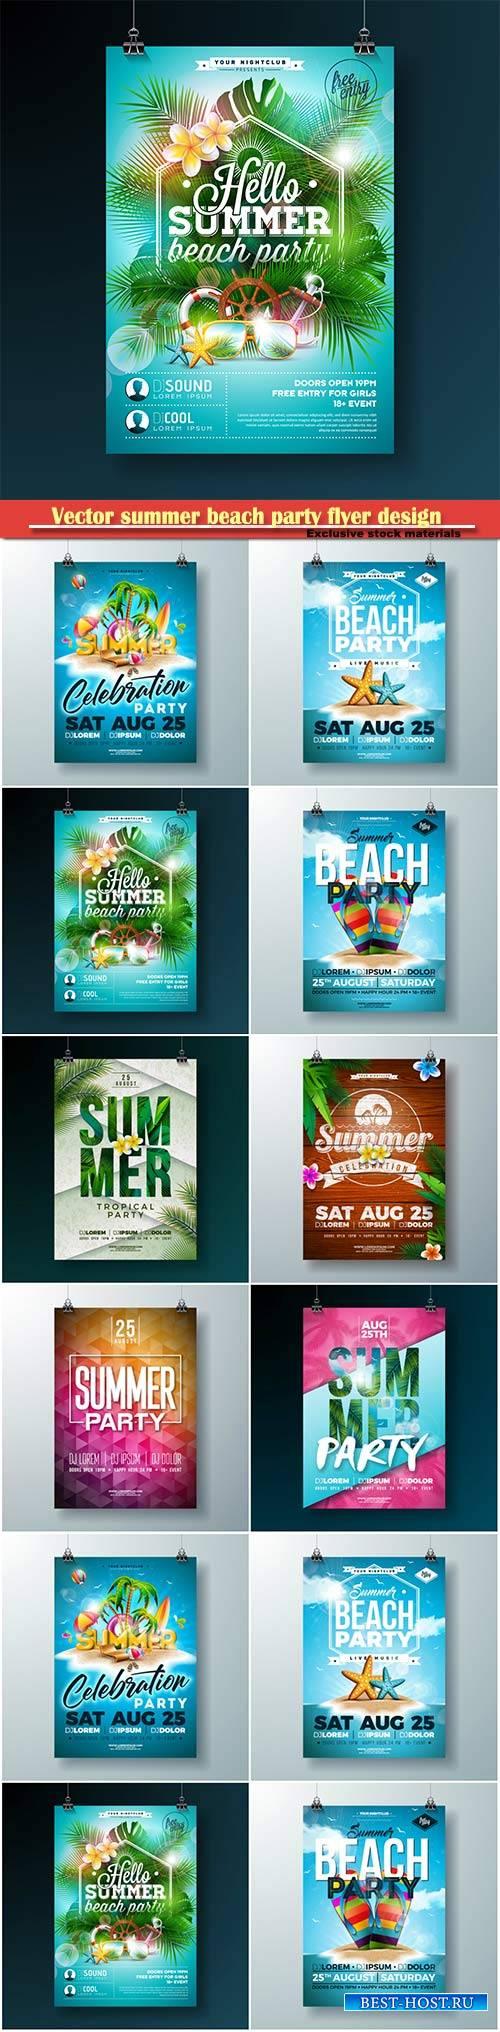 Vector summer beach party flyer design # 2